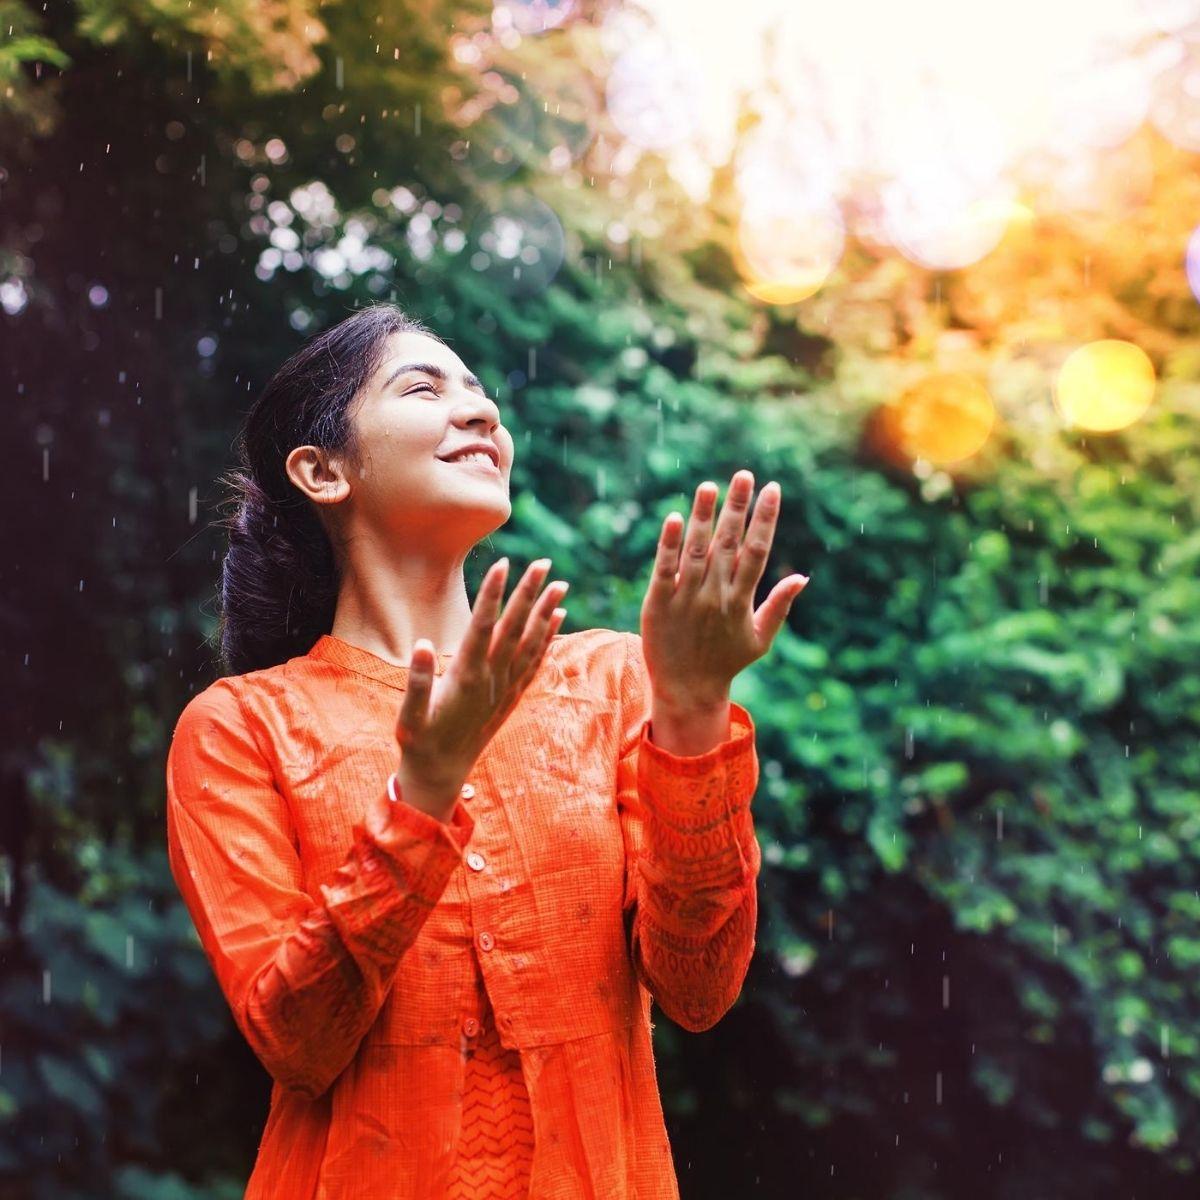 mujer disfrutando la lluvia